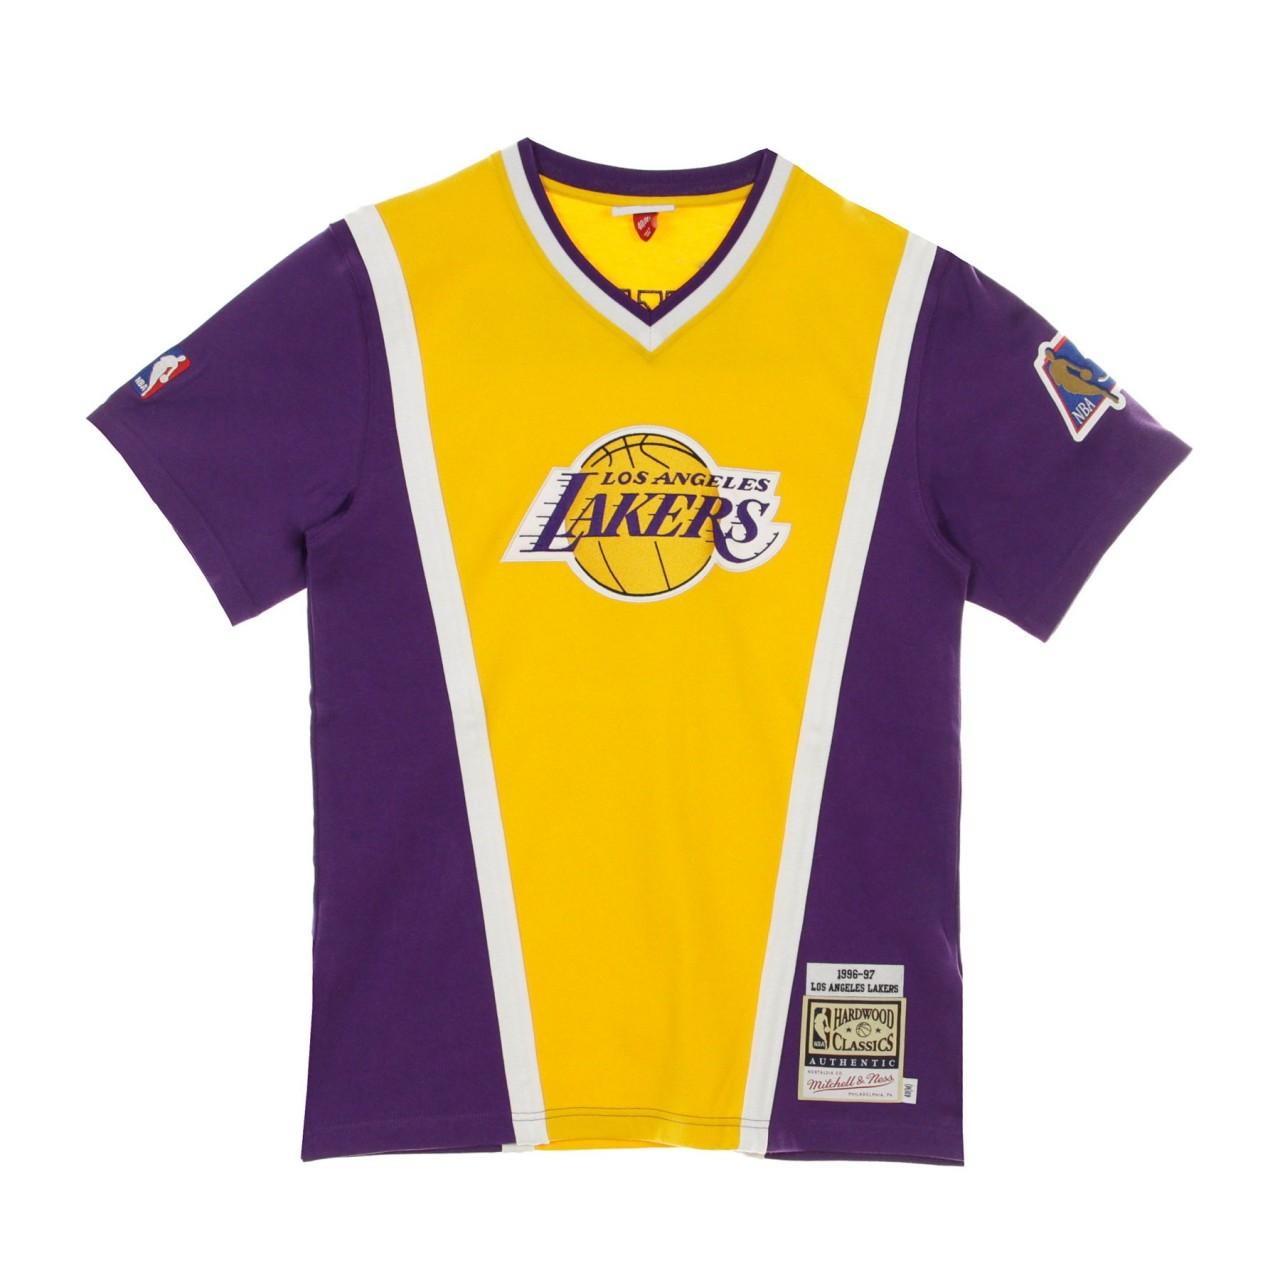 MITCHELL & NESS NBA AUTHENTIC SHOOTING SHIRT HARDWOOD CLASSICS 1996-97 LOSLAK ASSHSB20005-LALLTGD96